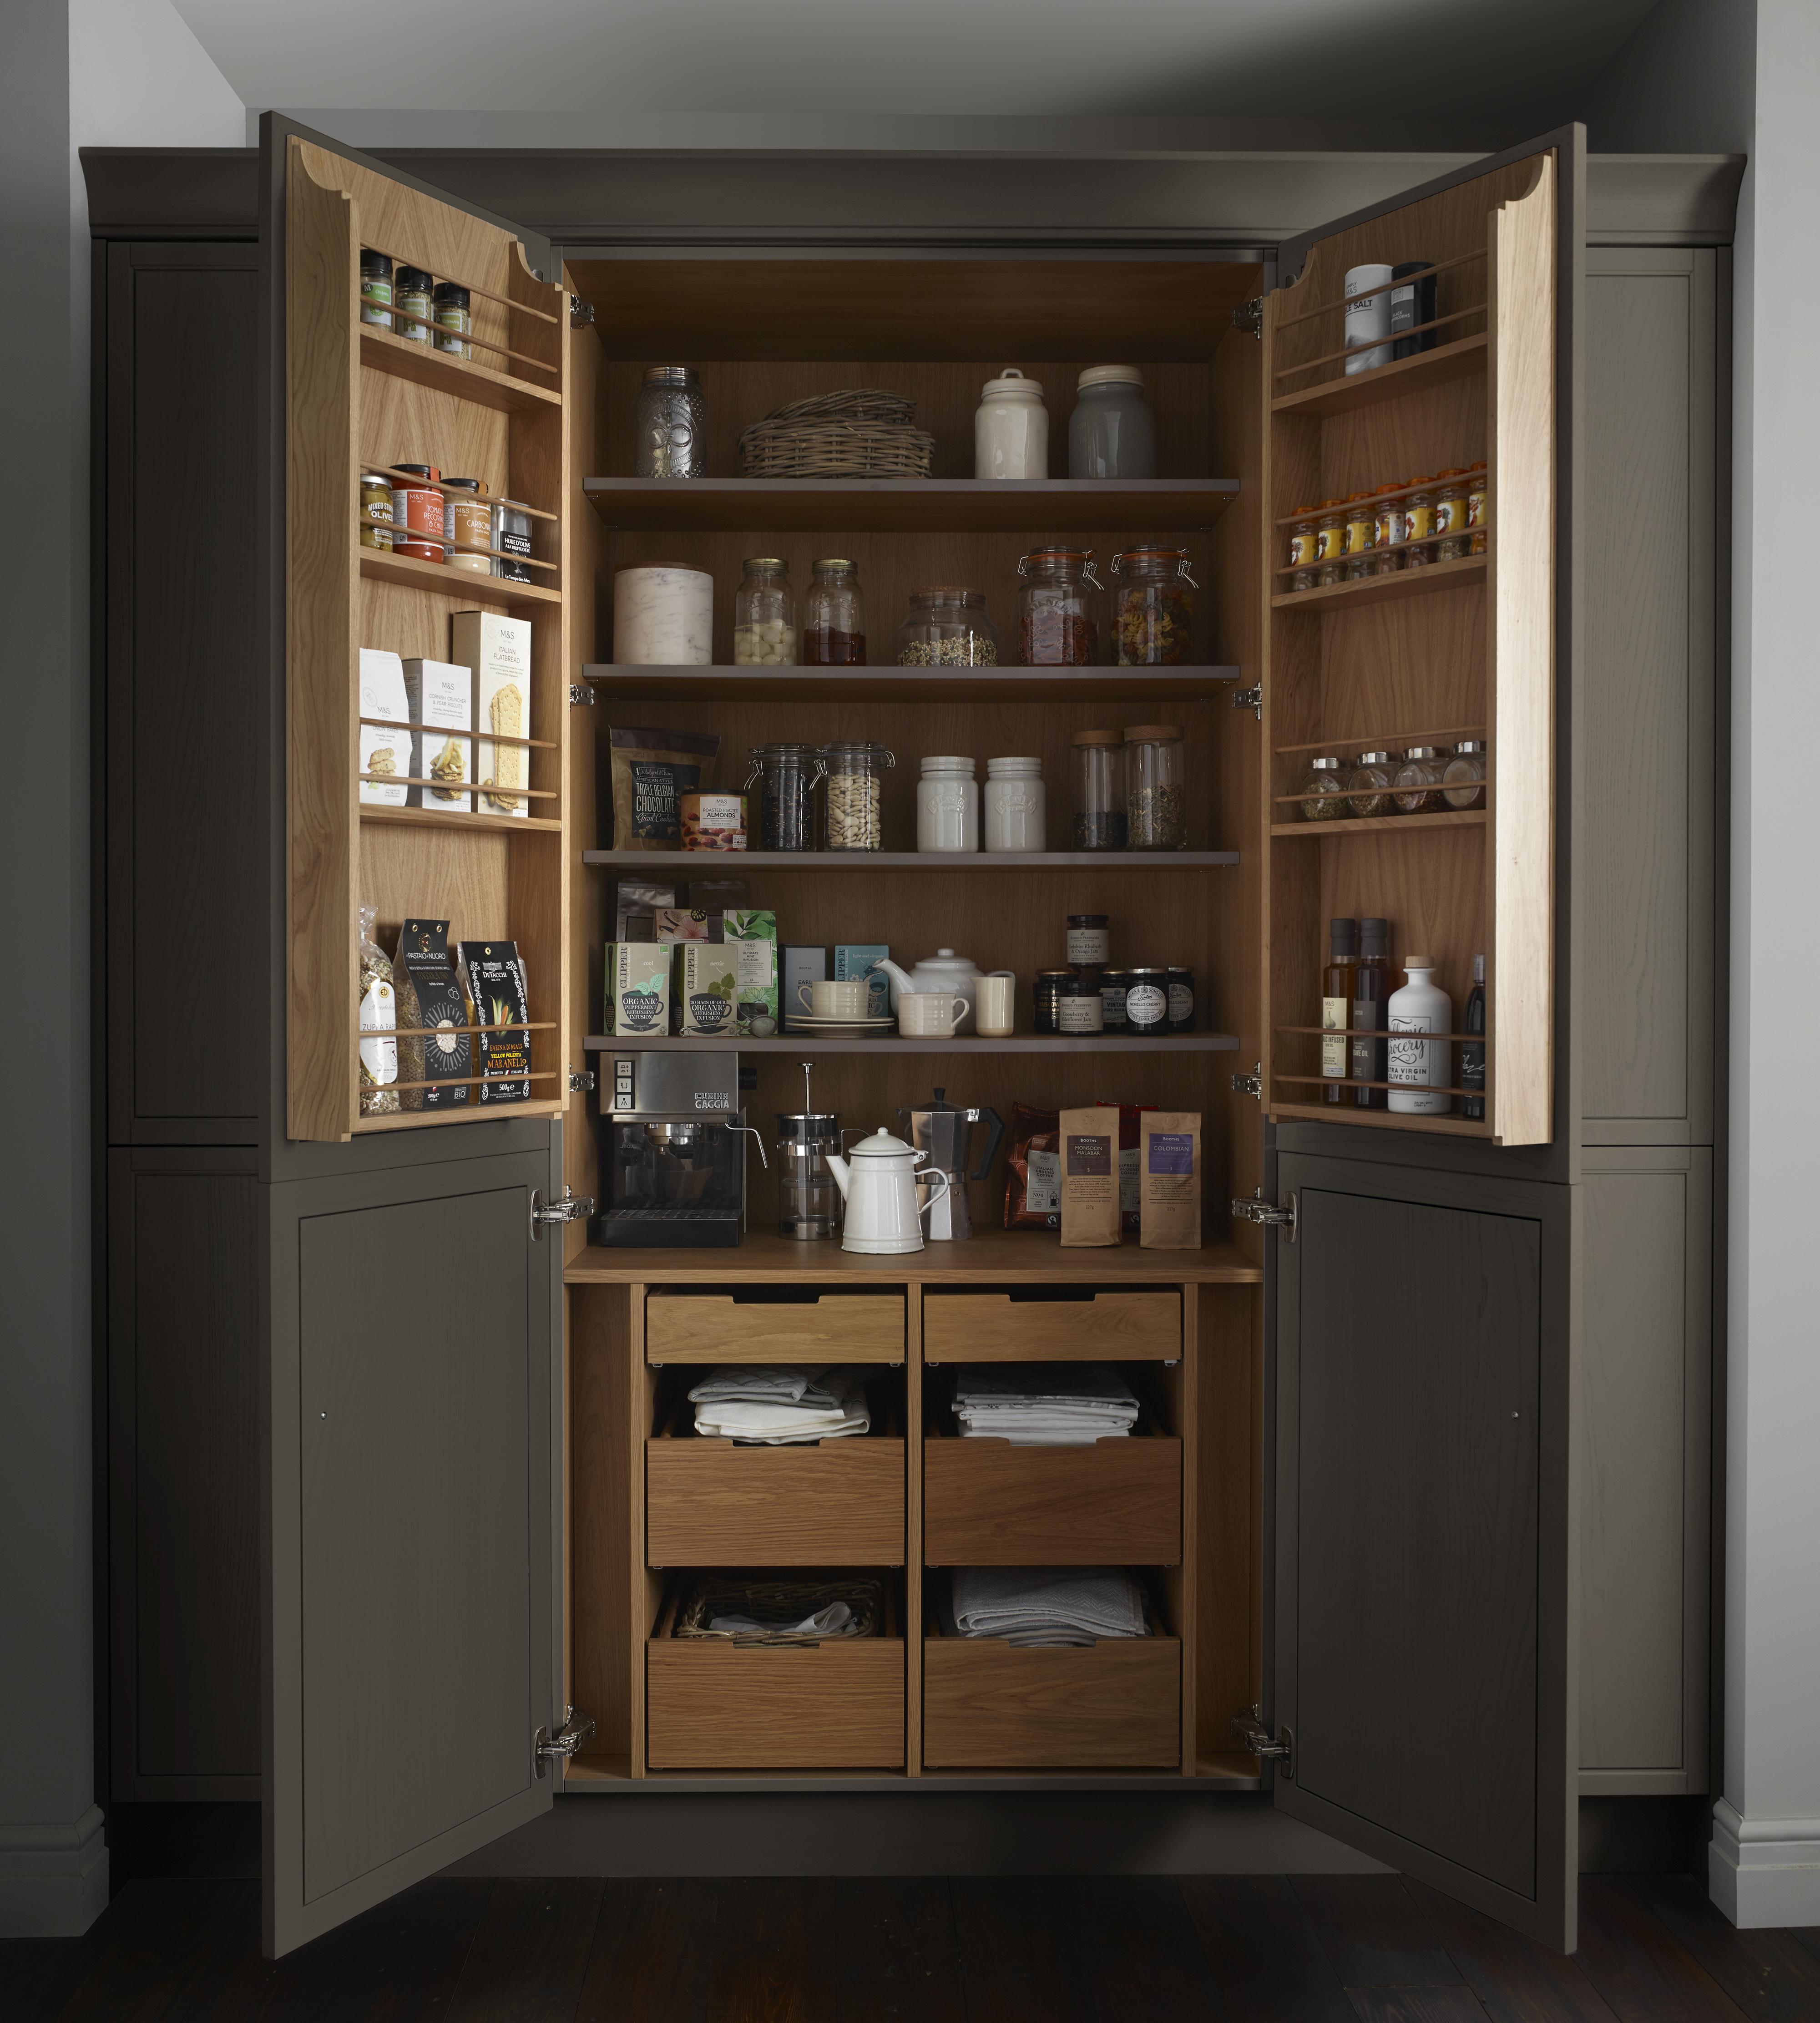 Harbury Kitchen Cameo 4 butler's pantry